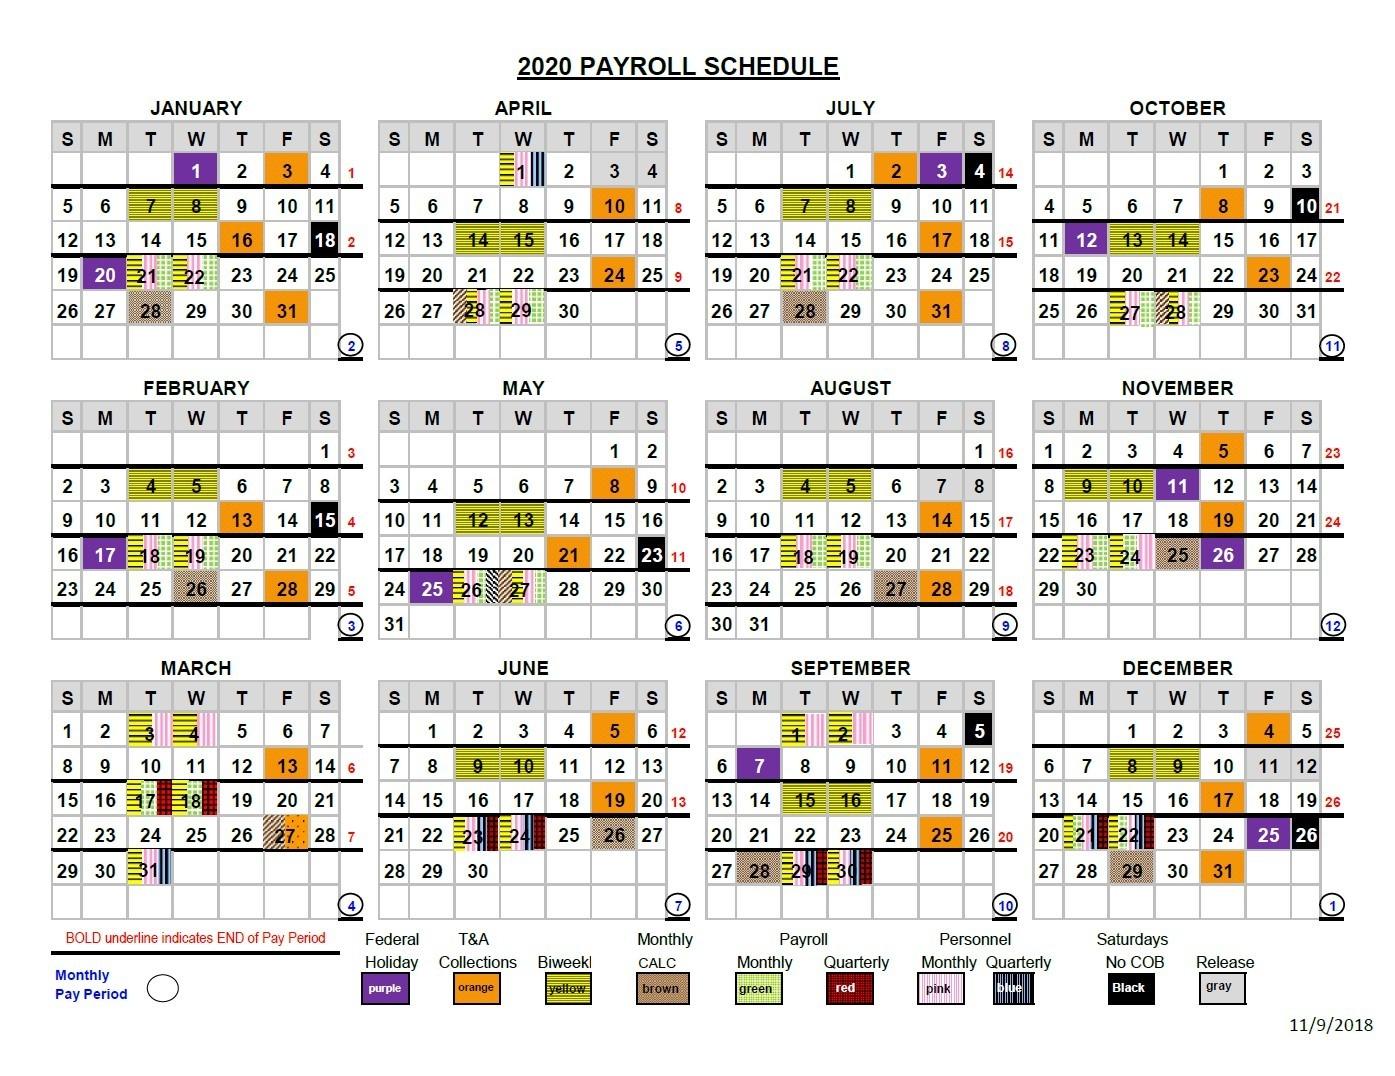 Va Fsc Payroll Calendar 2021 | Payroll Calendar 2021  Fsc Calendar 2021